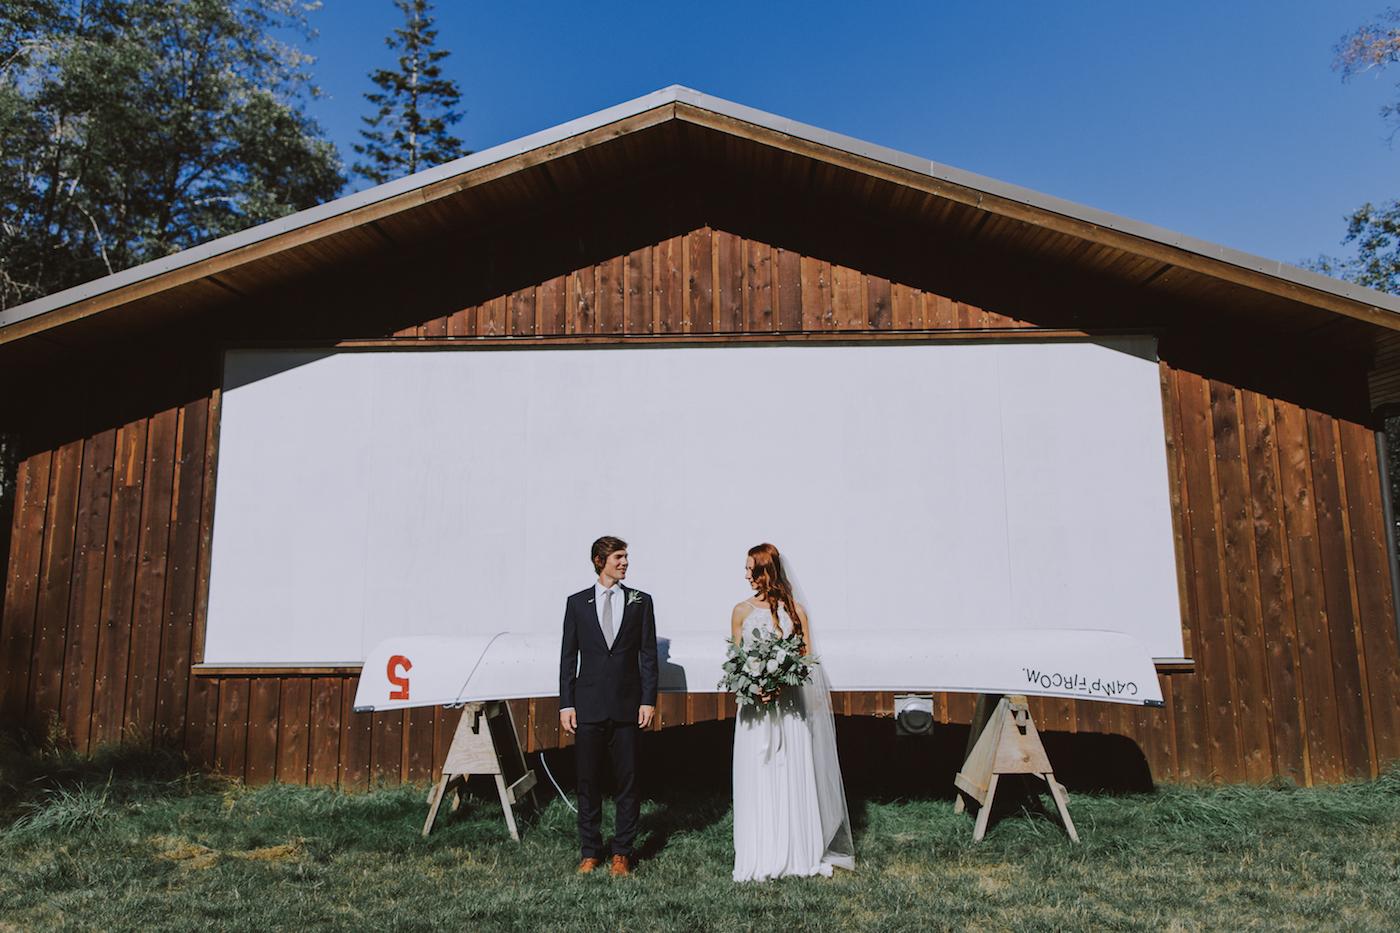 Wedding-Camp-Fircom-Gambier-Island-5.jpg